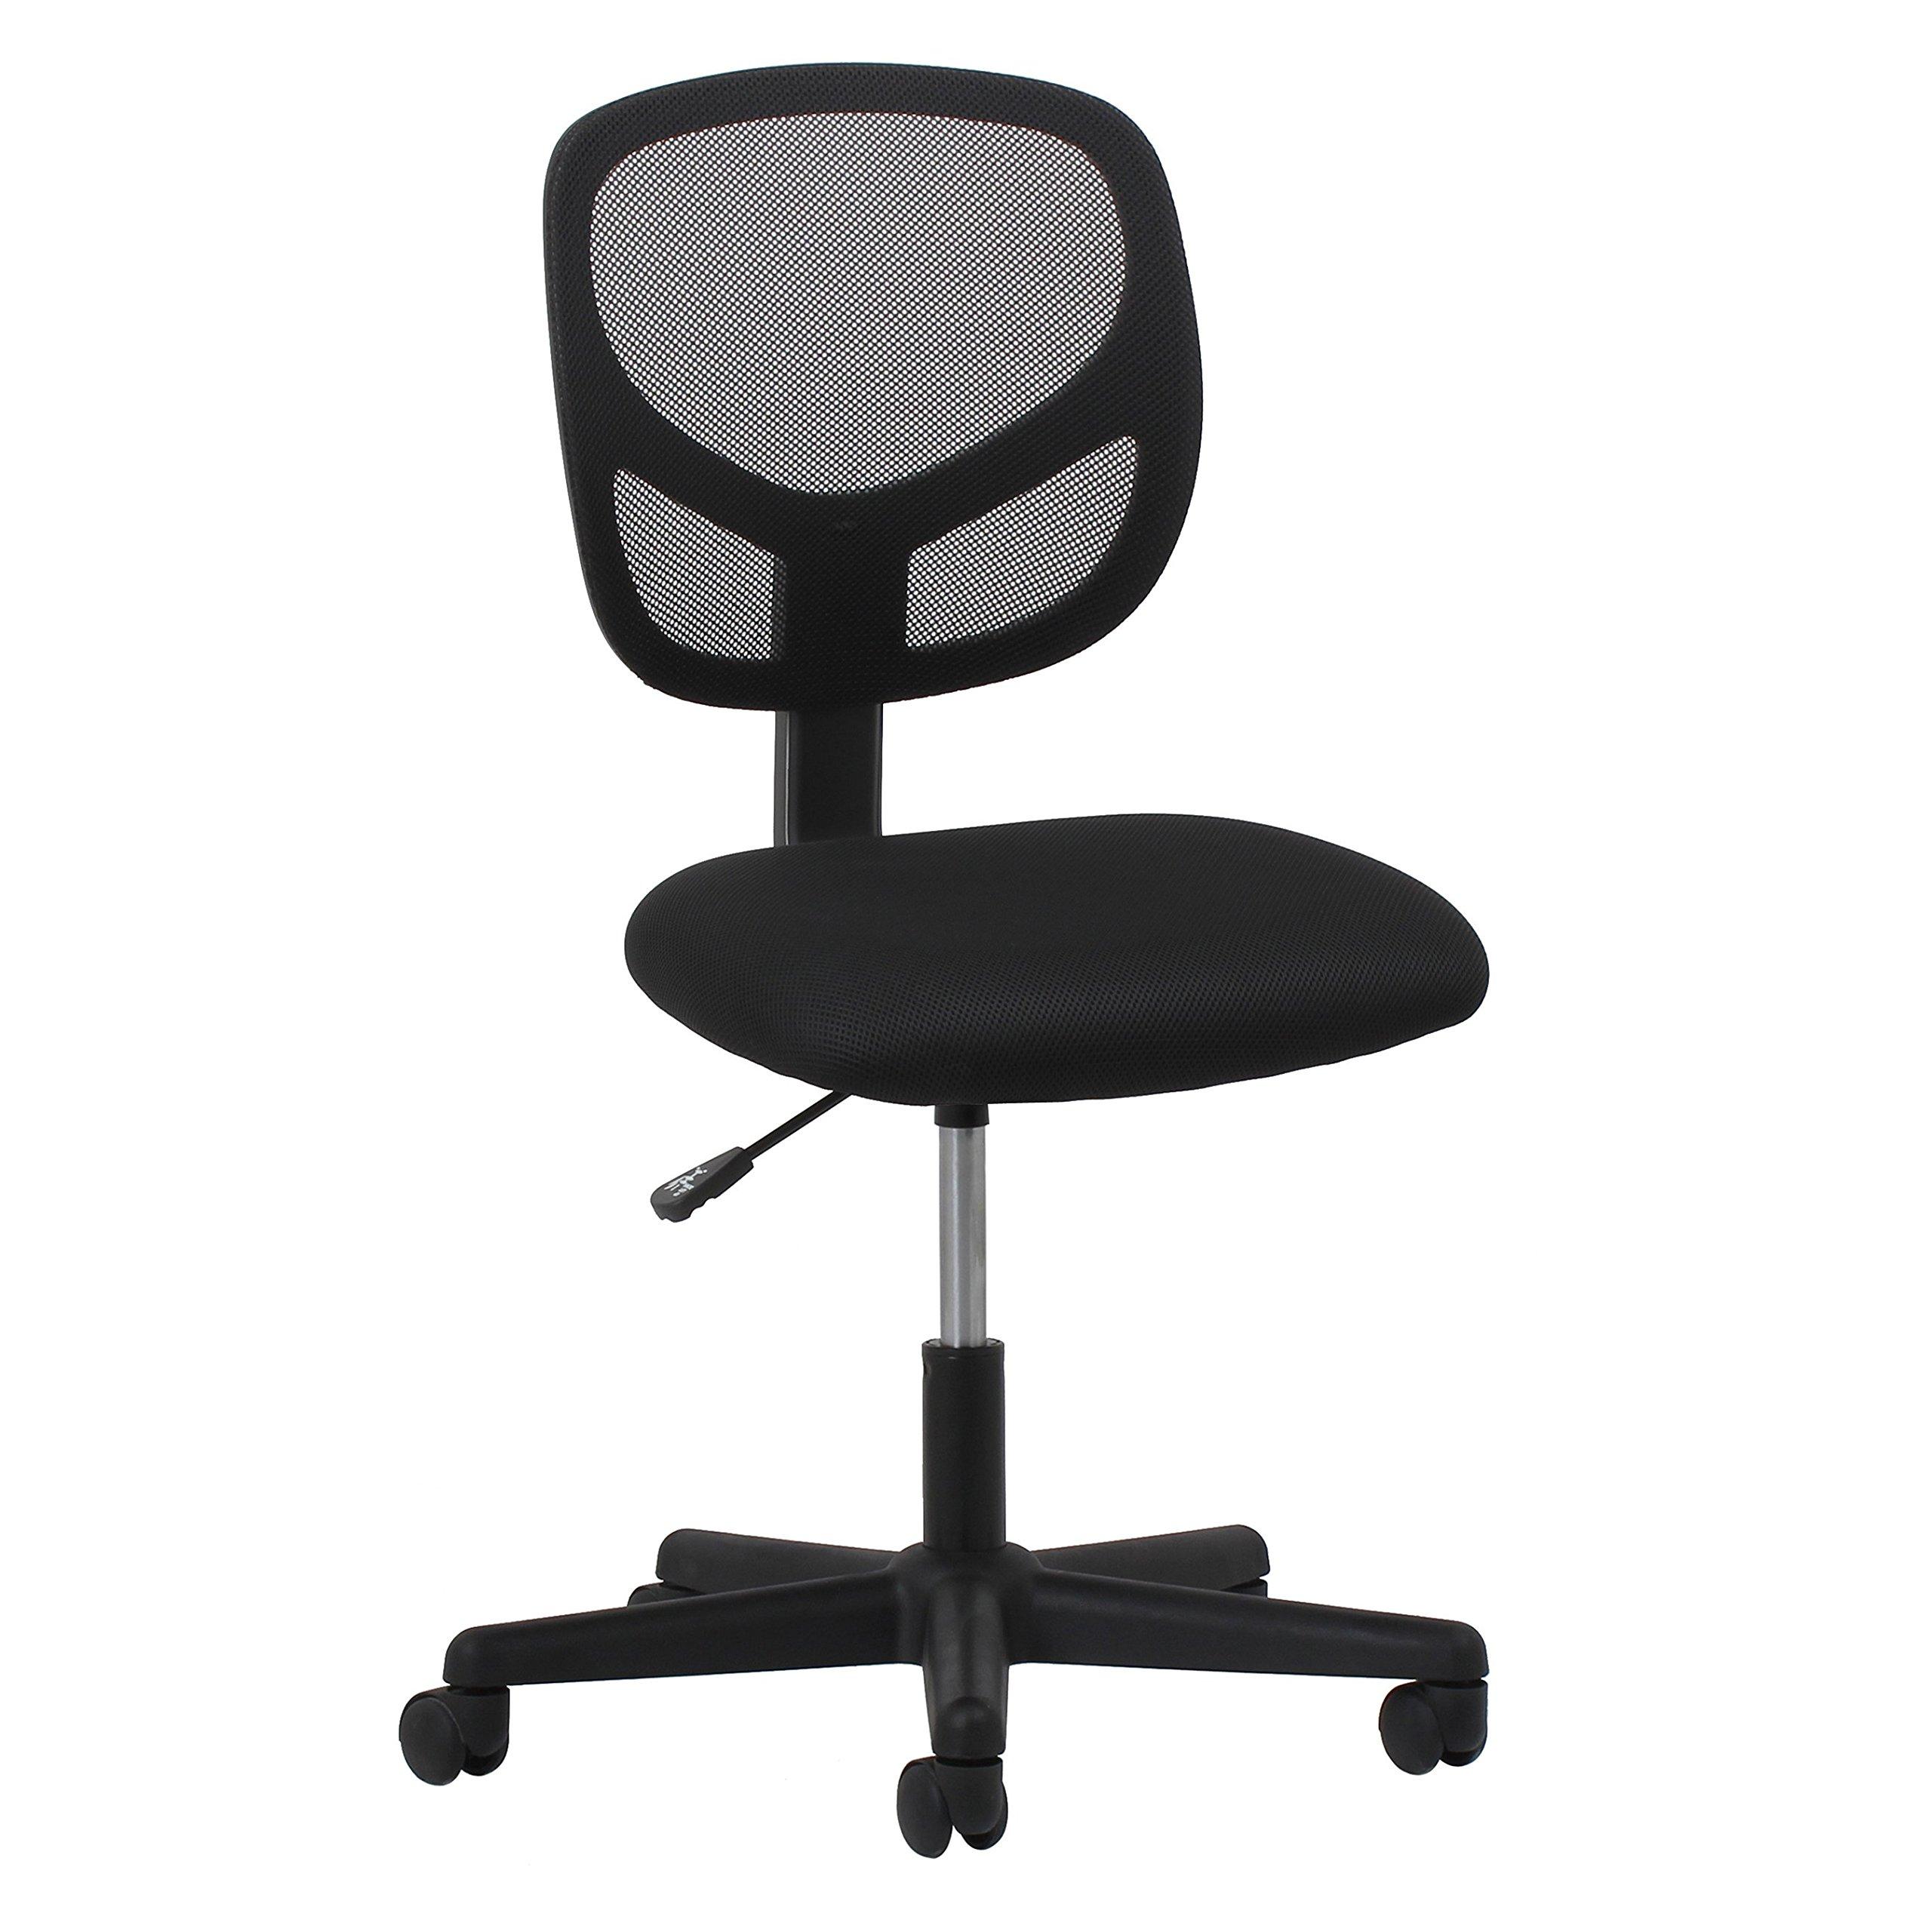 Essentials Swivel Armless Mid Back Mesh Task Chair - Ergonomic Computer/Office Chair (ESS-3000)